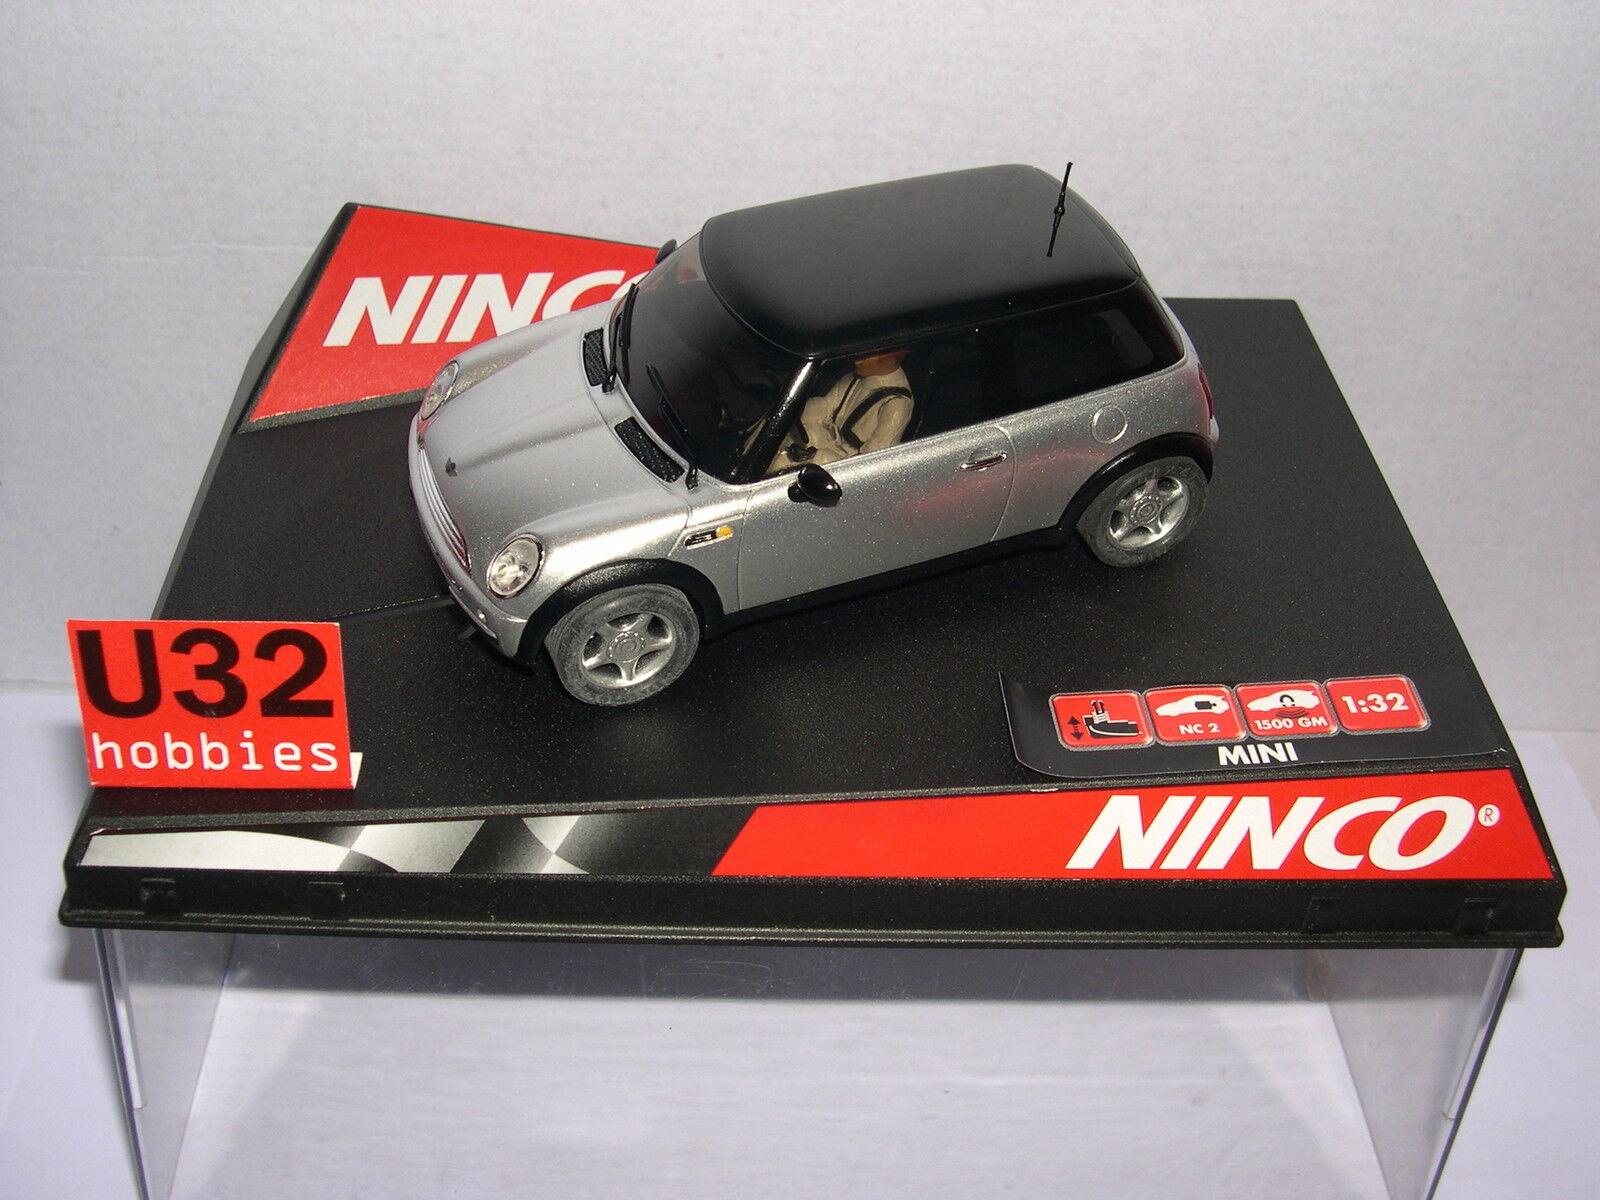 Goût élégant et choix distingué. NINCO 50278 SLOT SLOT SLOT CAR MINI COOPER ARGENT ROAD CAR MB 7a359a